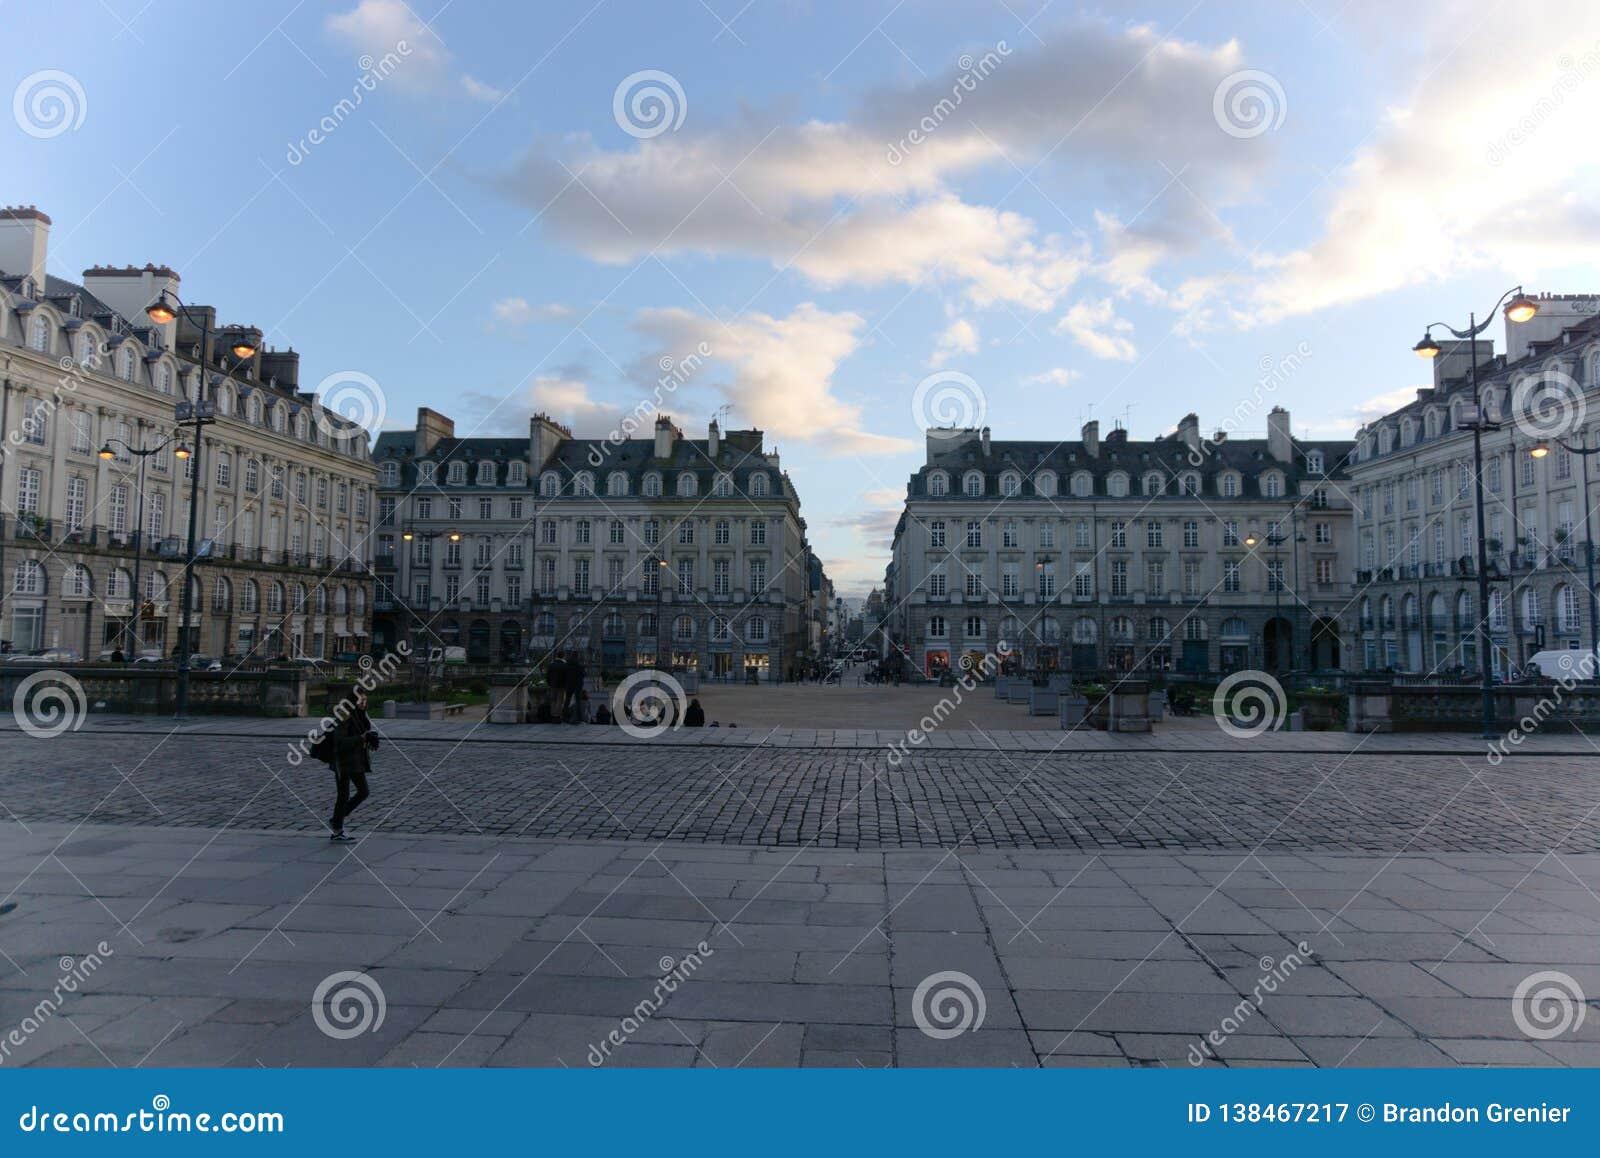 Parliament square Rennes France